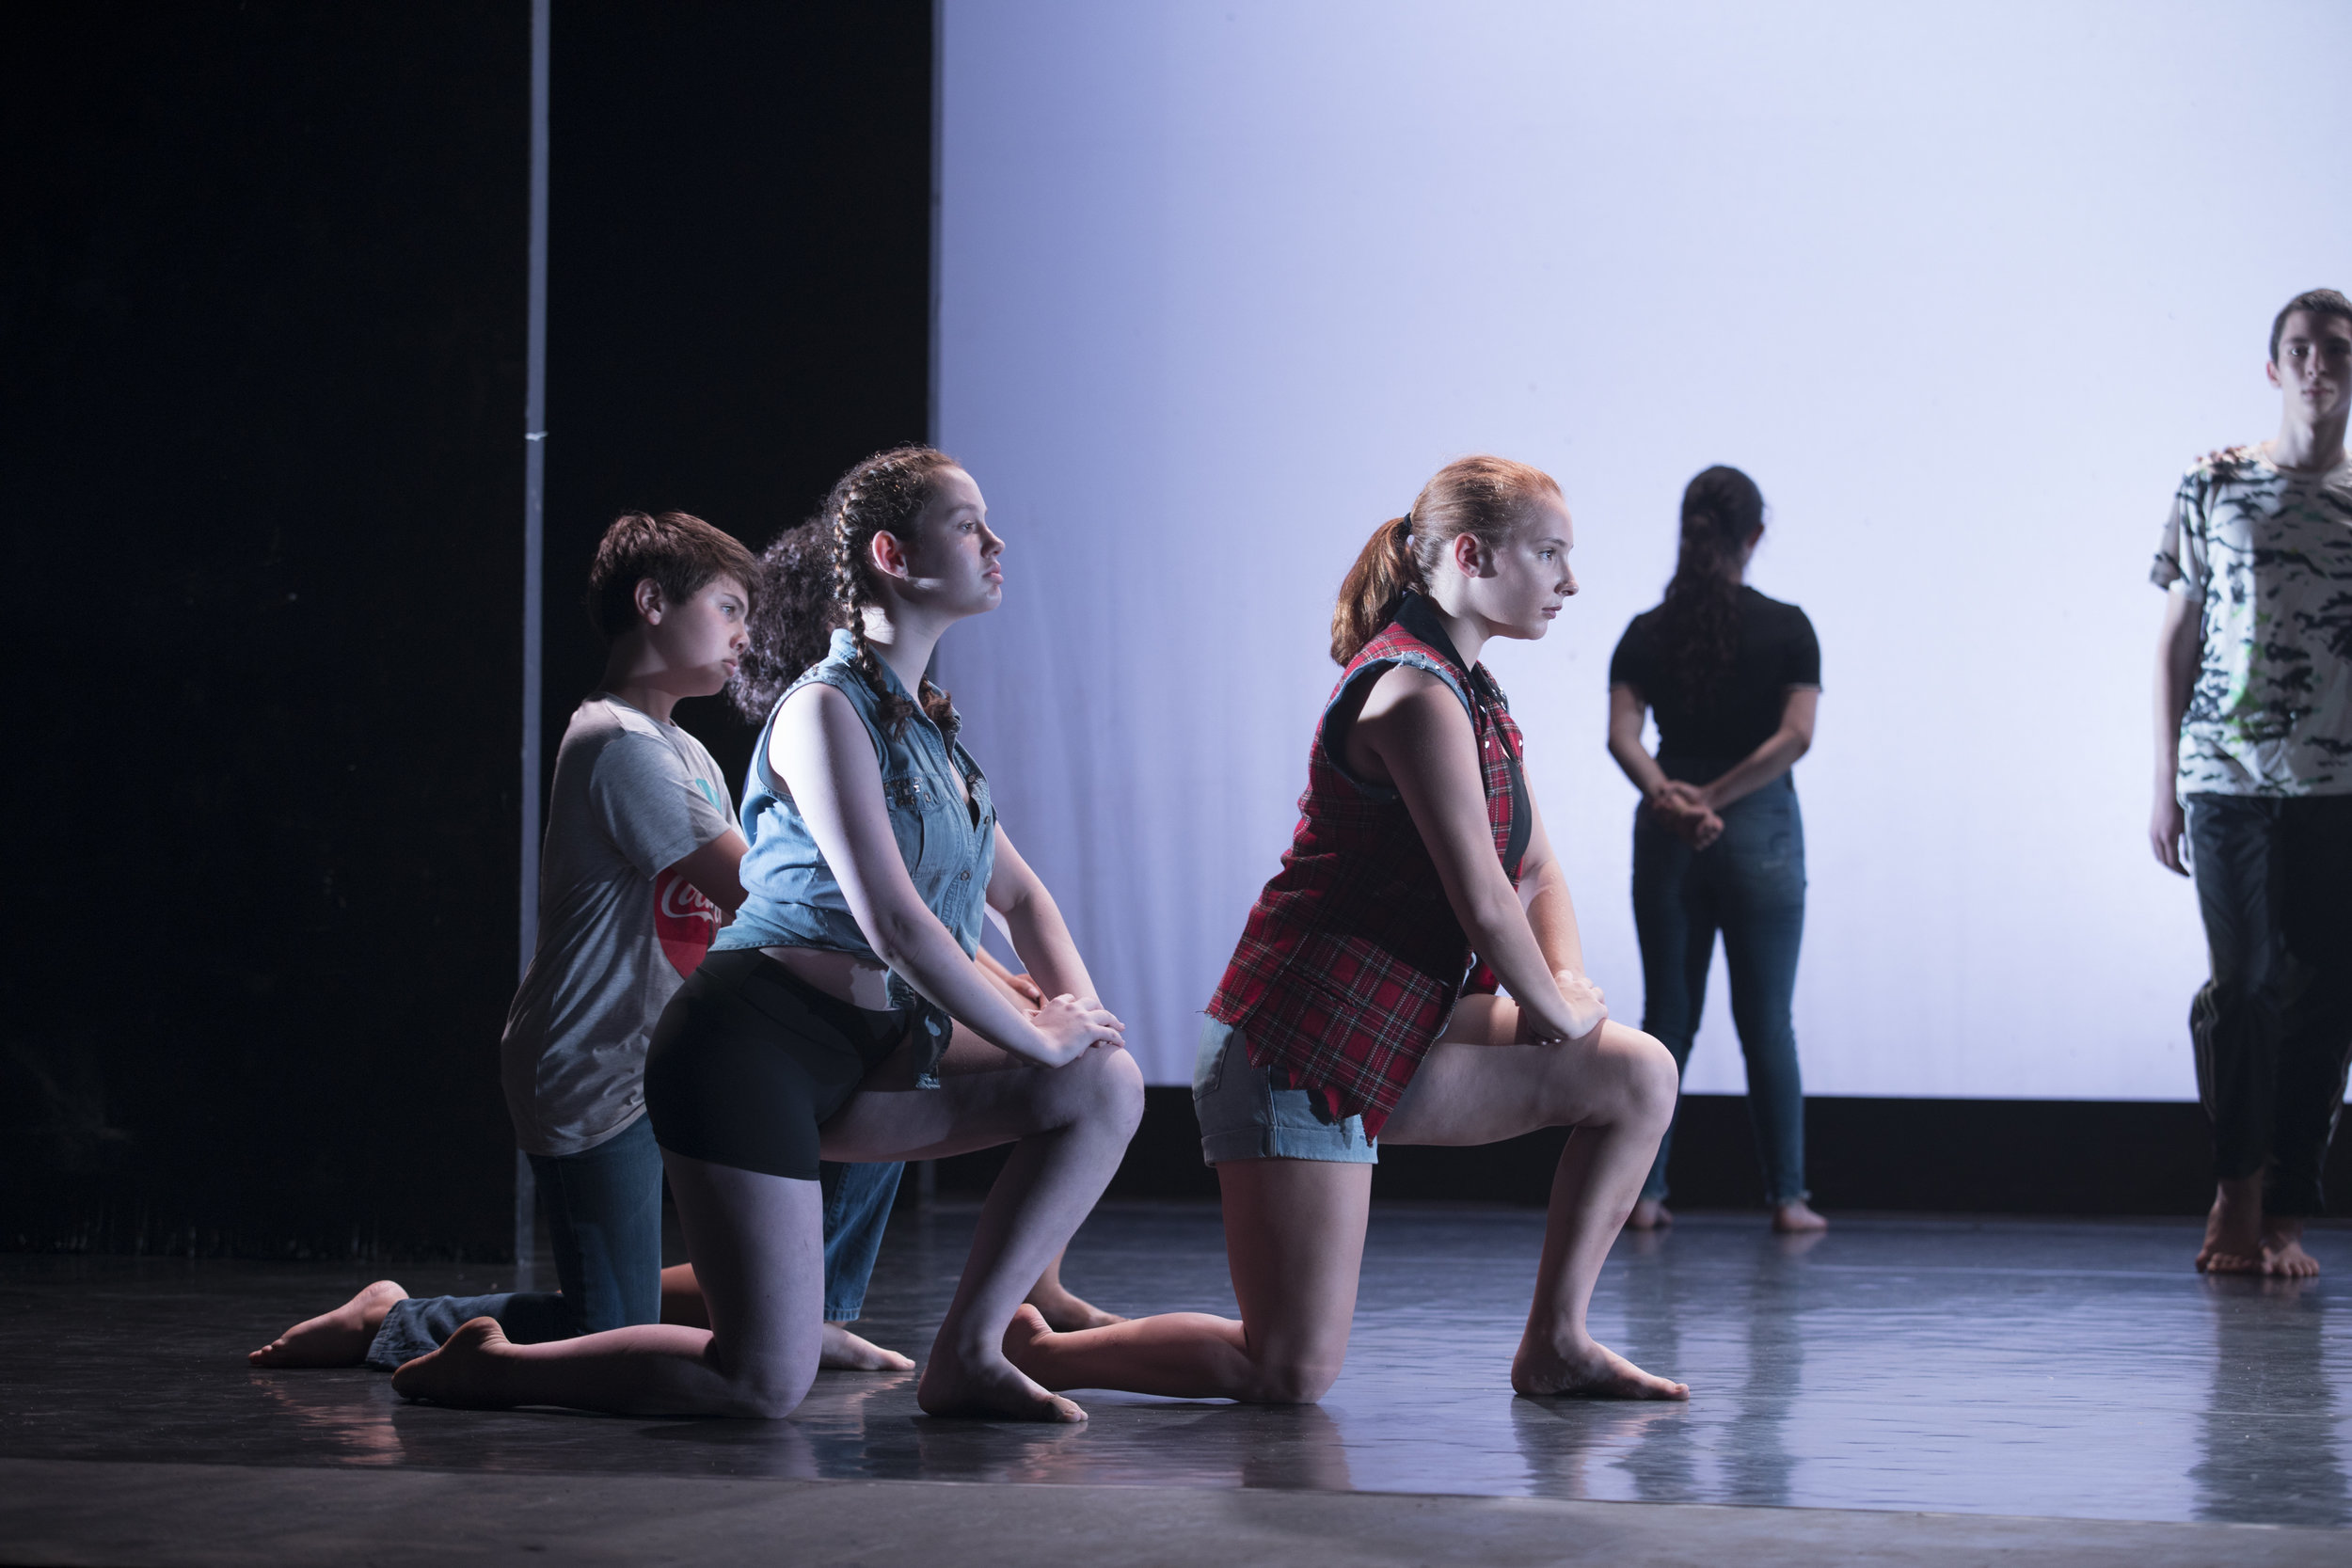 Dance Show by Jehanne-Marie Milne-93.jpg